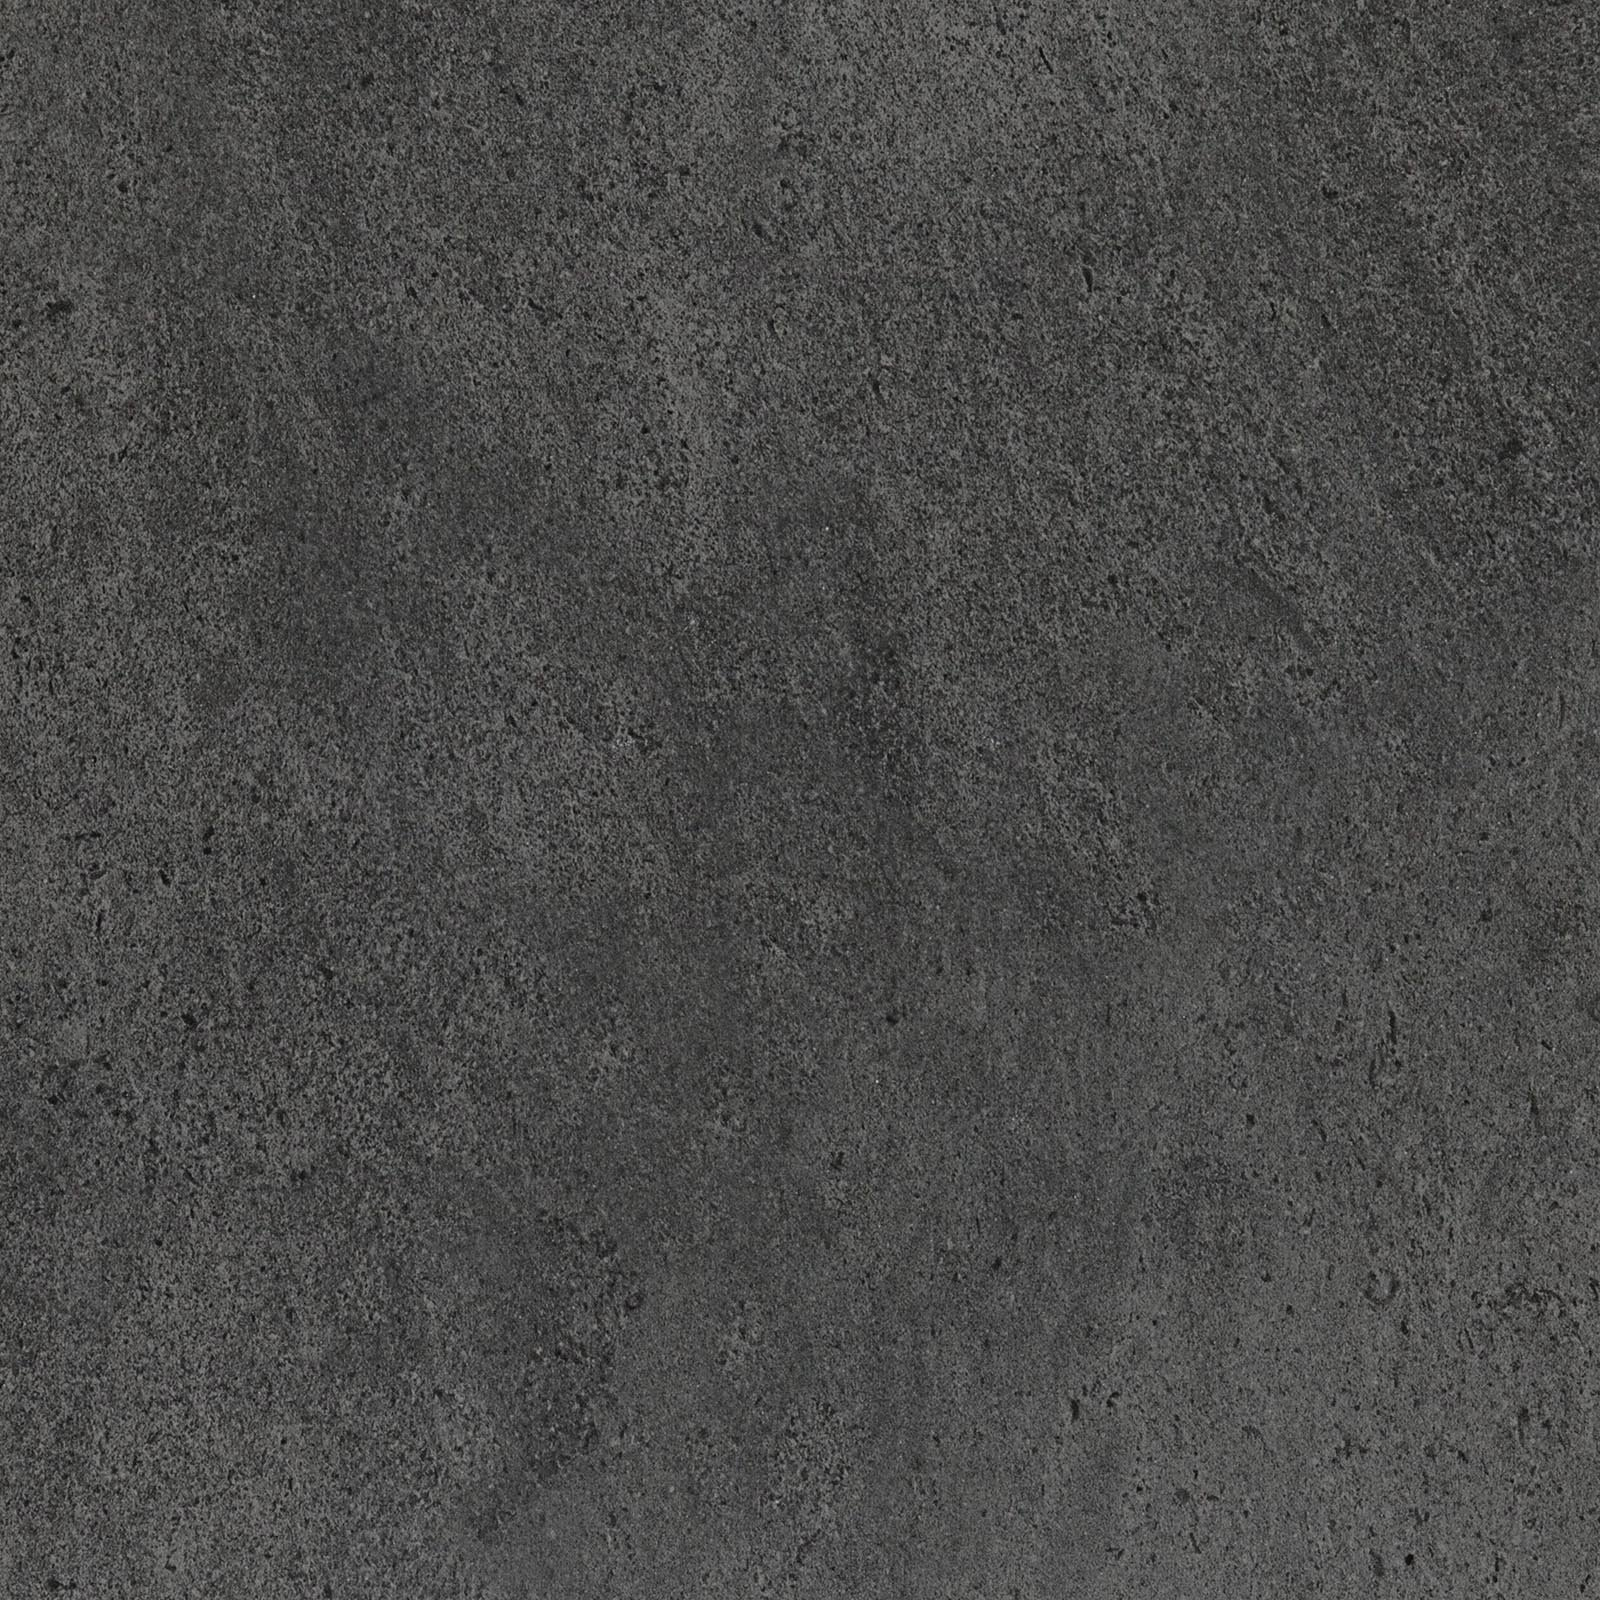 38a Stonework antrazit MLHC R9 60x60 - Hansas Plaadimaailm